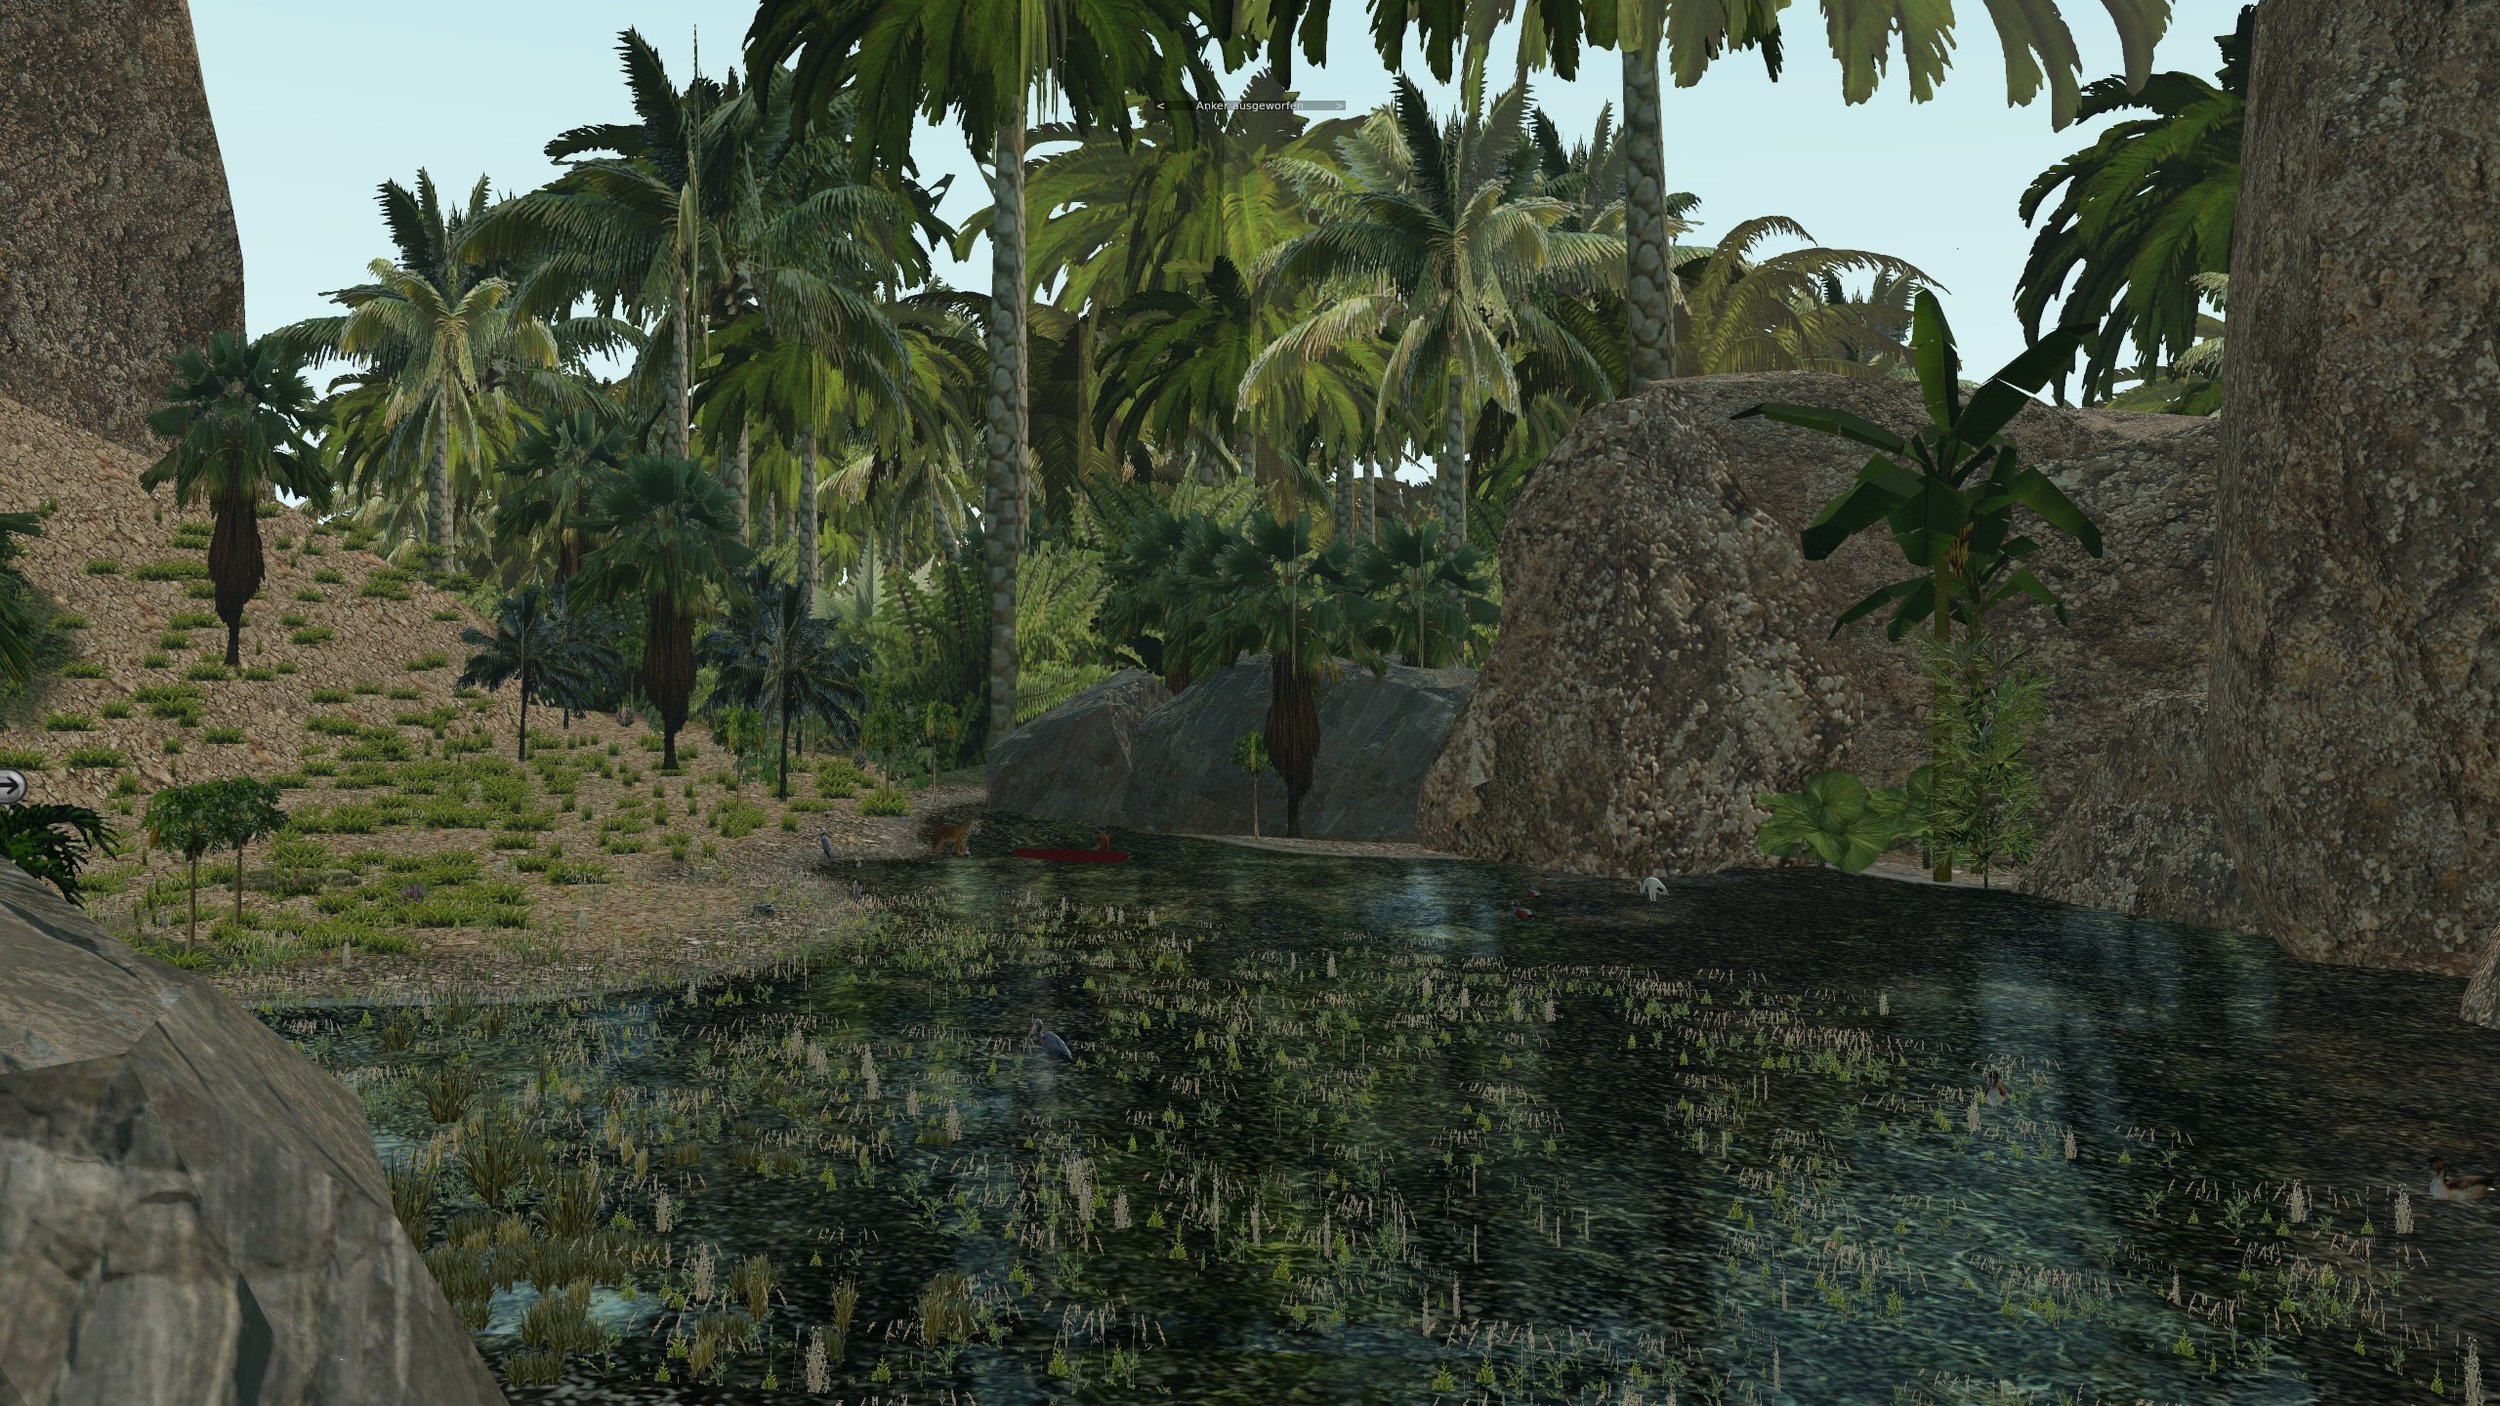 Quest_Kodiak_Amphib-LR_G1000_8.jpg